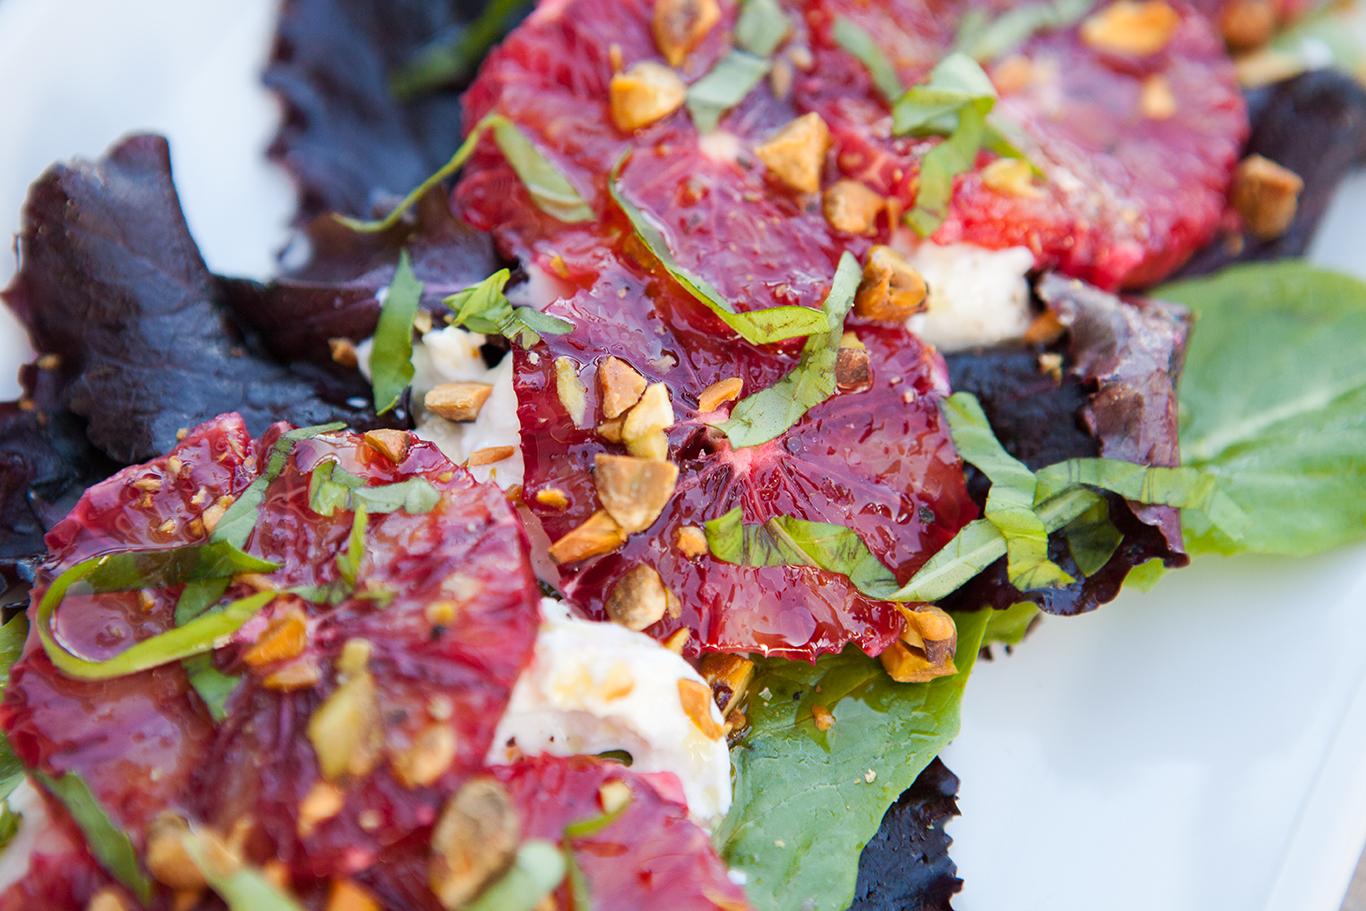 quinoa parfait blood orange and salmon salad with blood orange ...